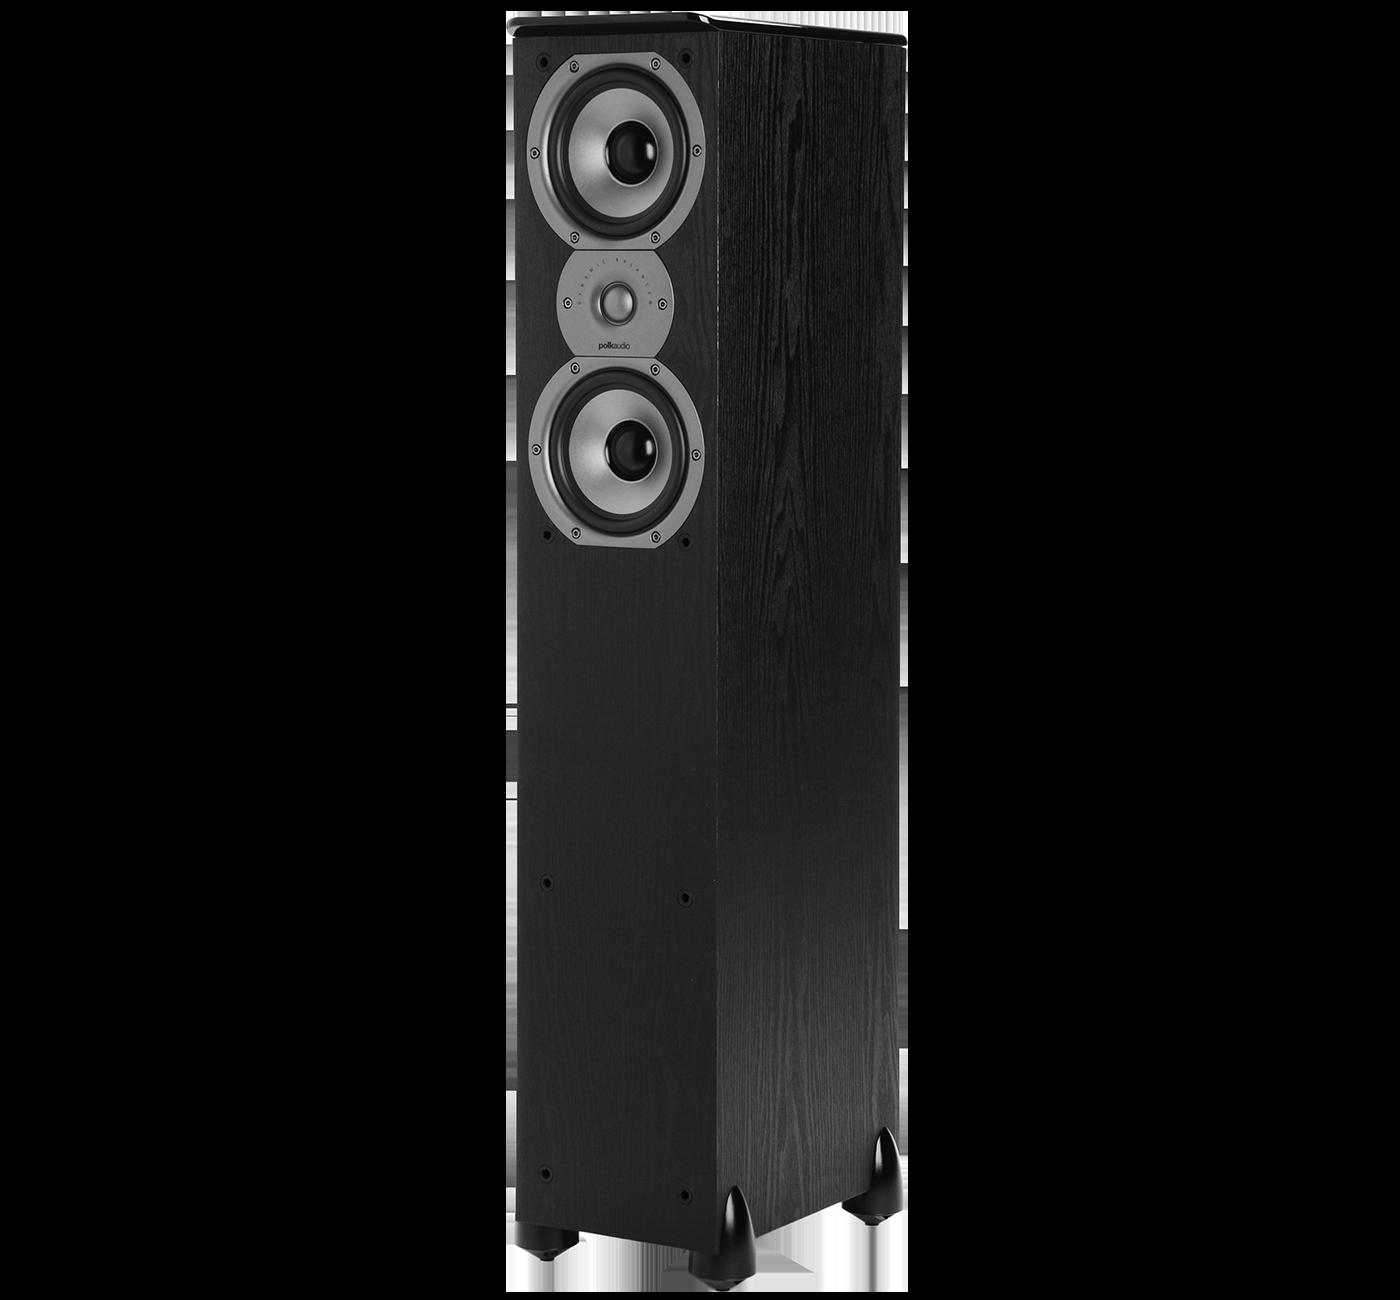 tsi300 polk audio. Black Bedroom Furniture Sets. Home Design Ideas